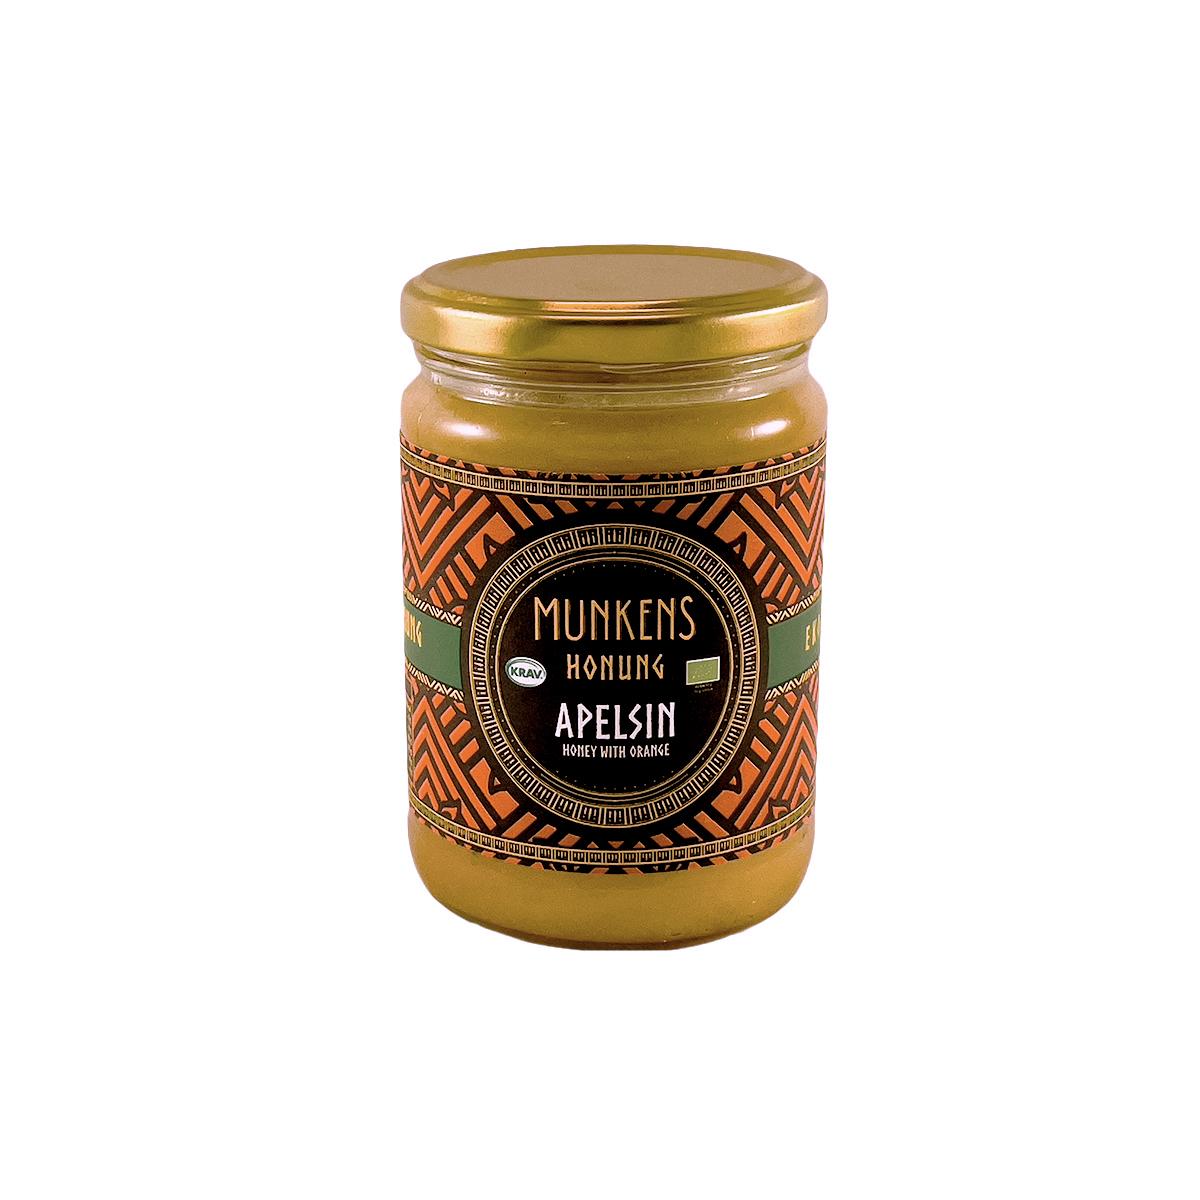 Munkens Honung – Kallrörd:Rå:Raw – Apelsin 500g